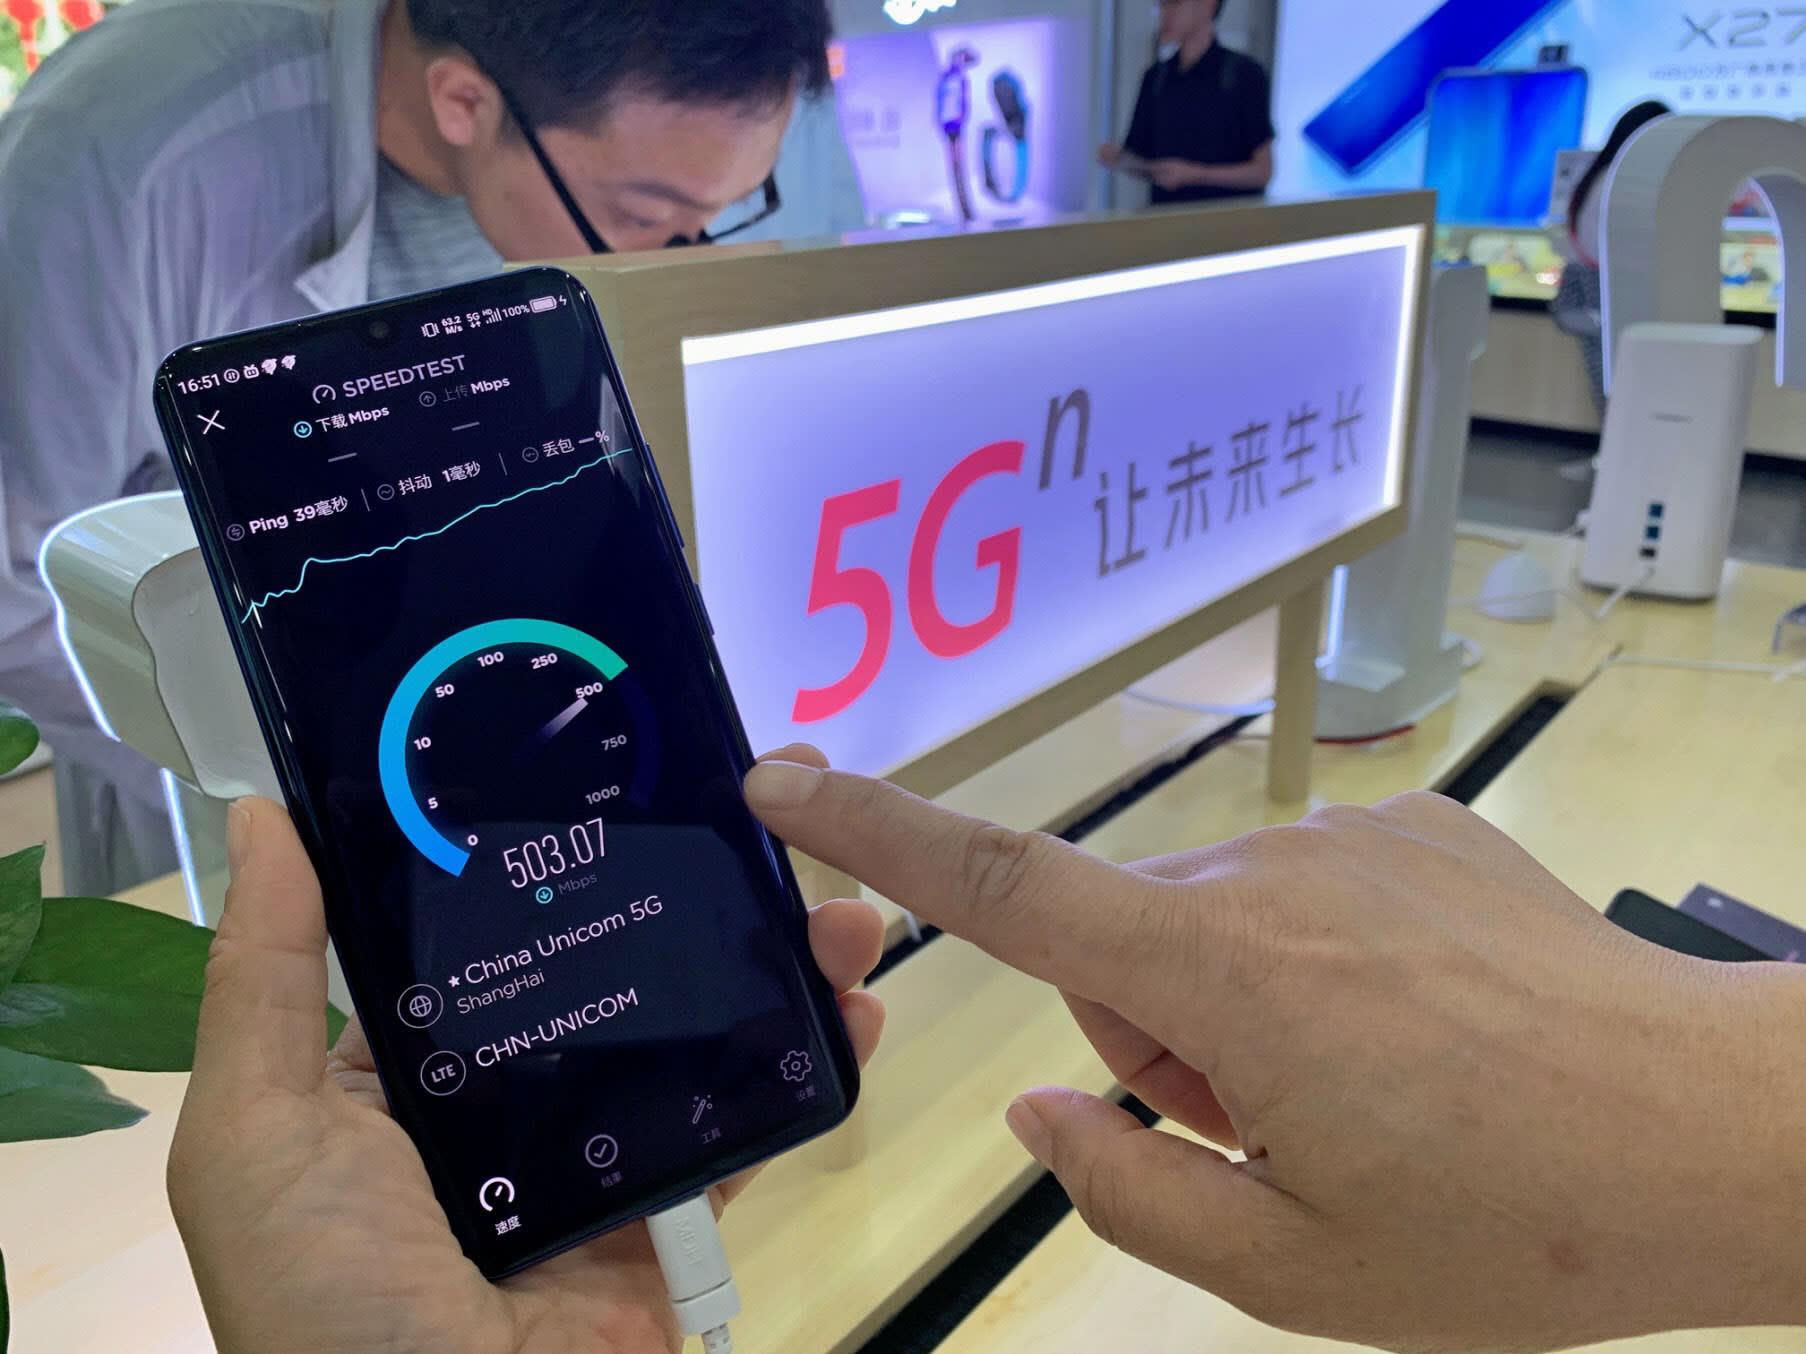 ZTE roars back to 5G race as Huawei reels under sanctions - Nikkei